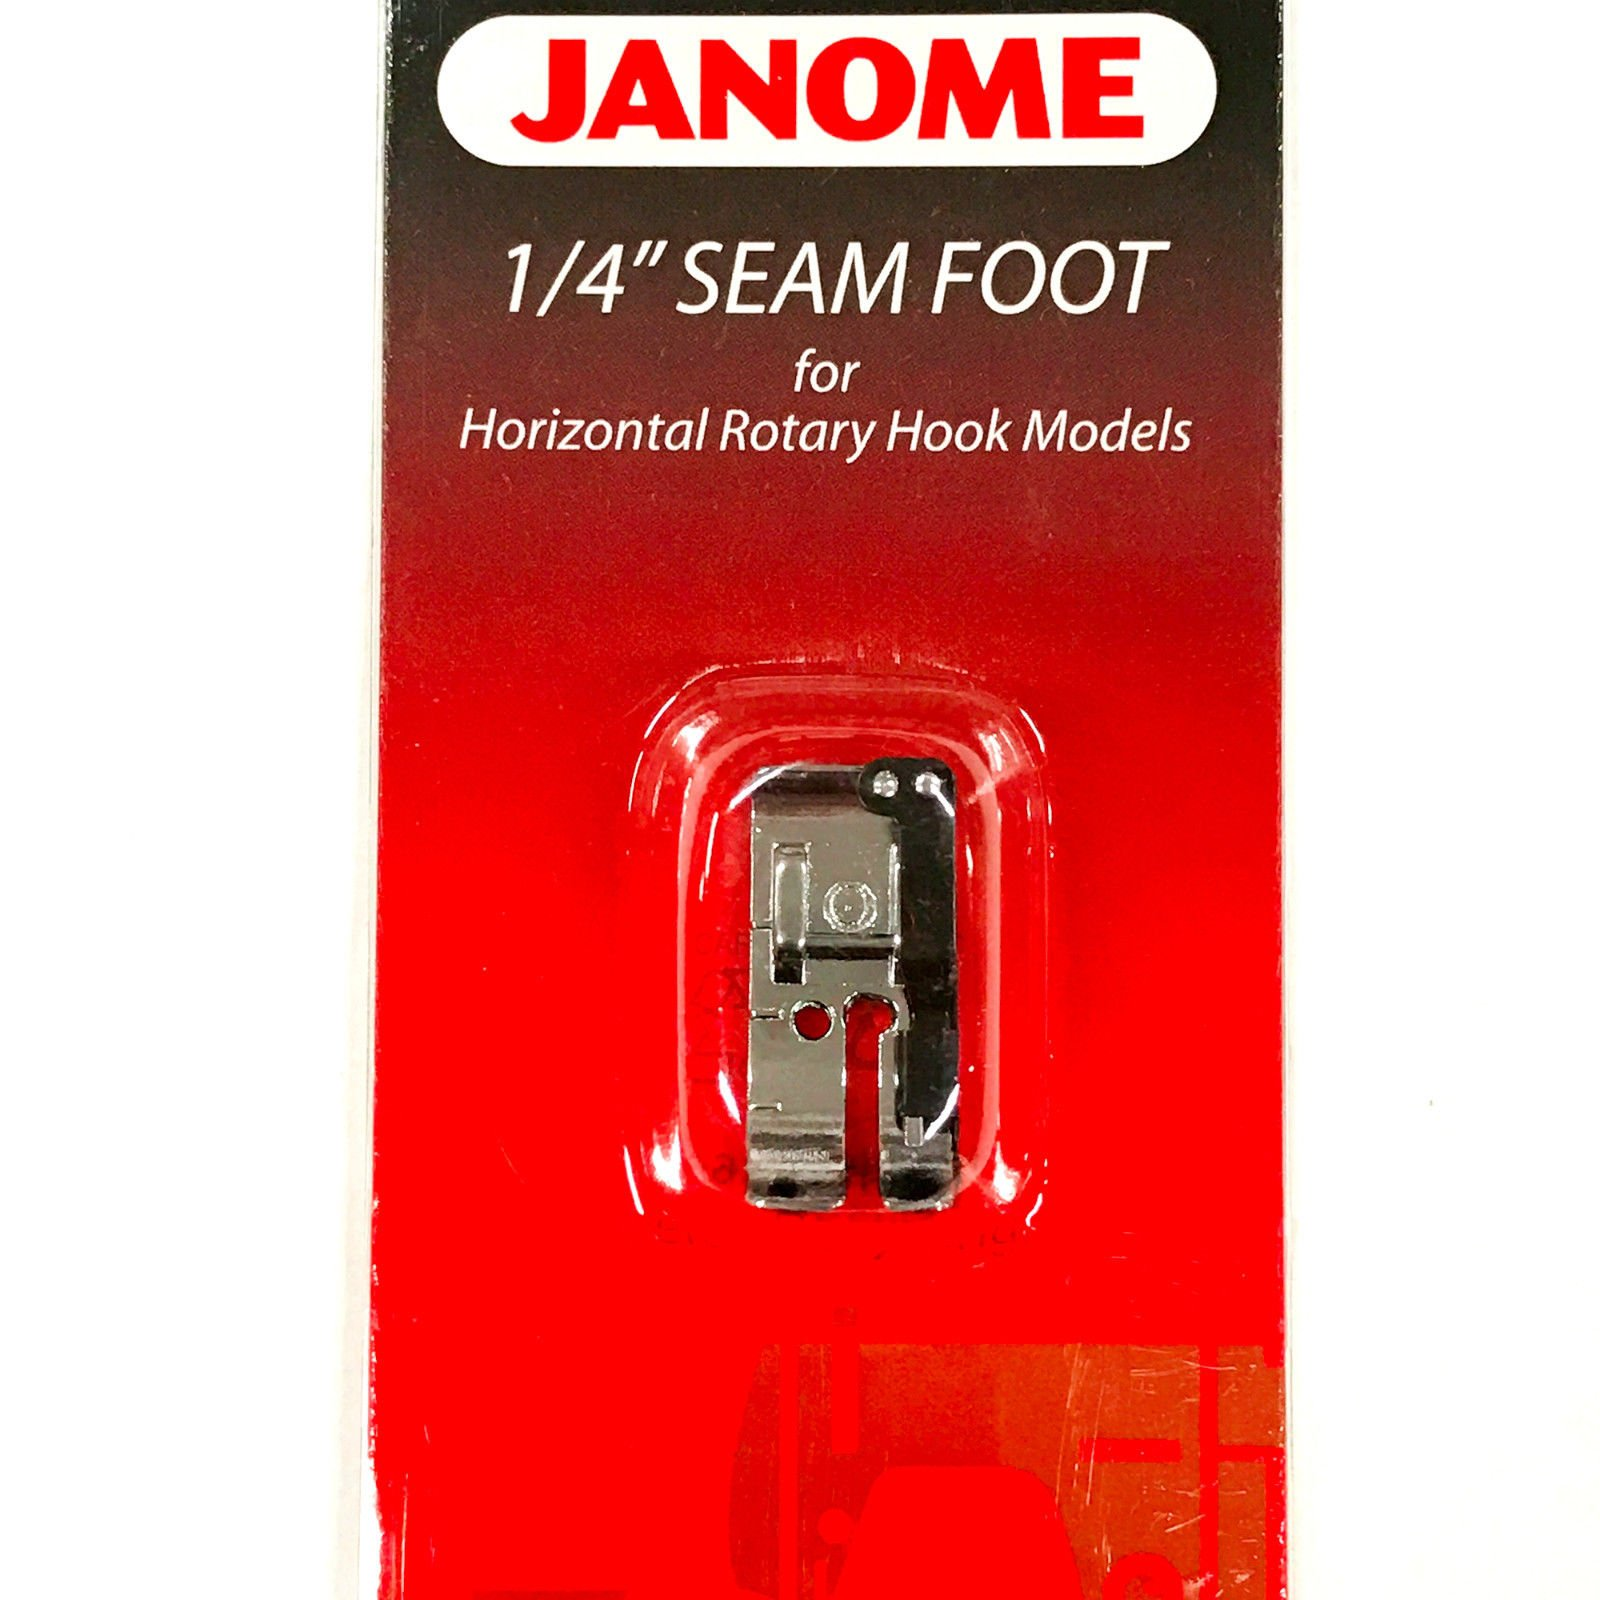 Janome 1/4 Seam Foot - 200318000